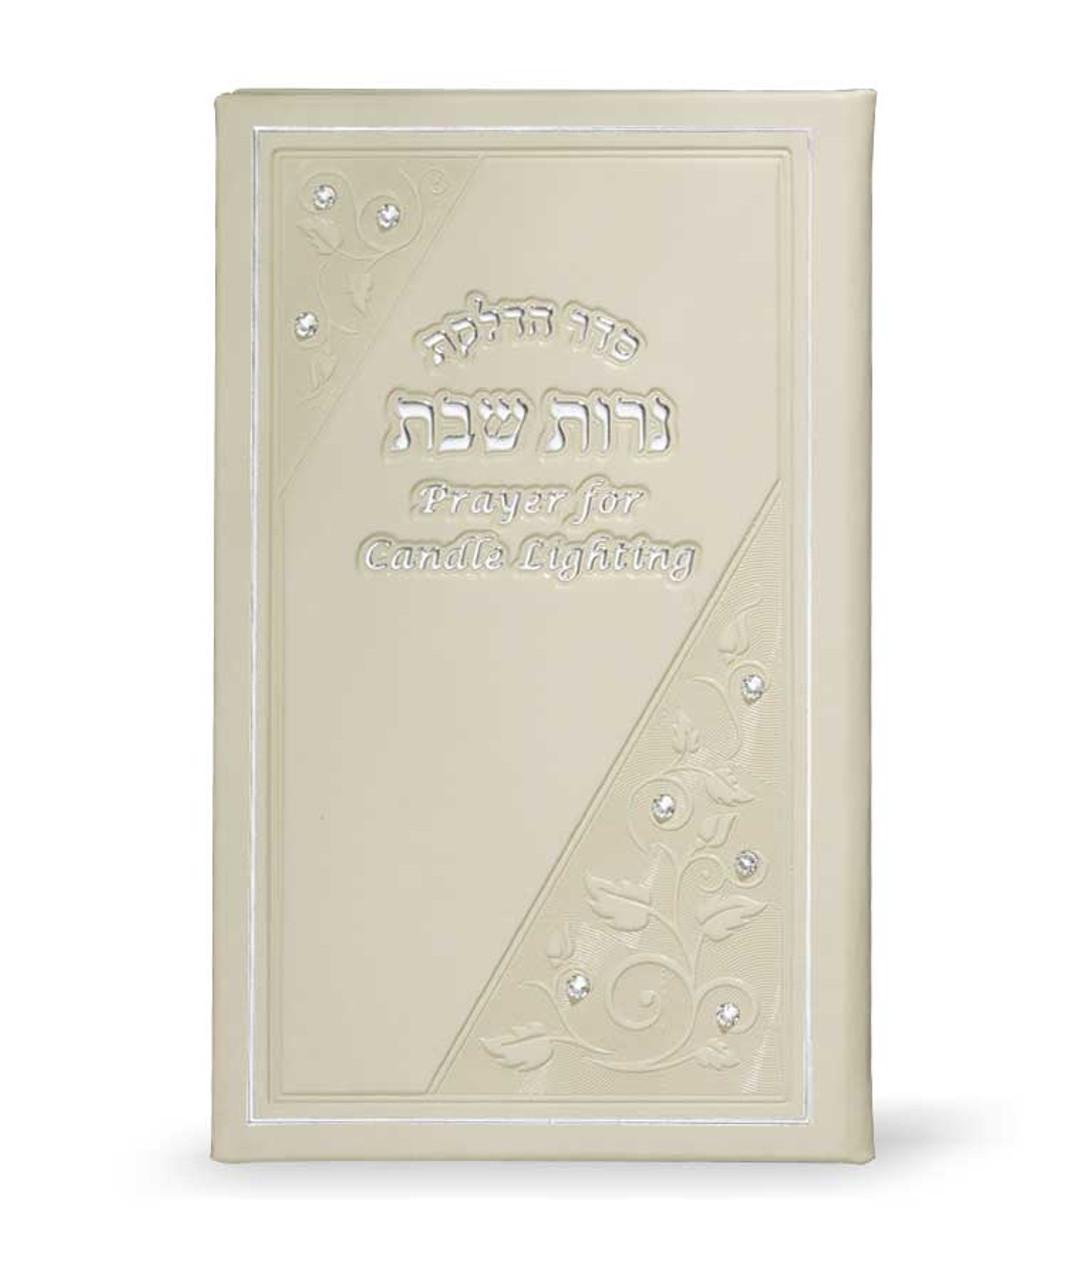 Pearl White Candle-Lighting Prayer